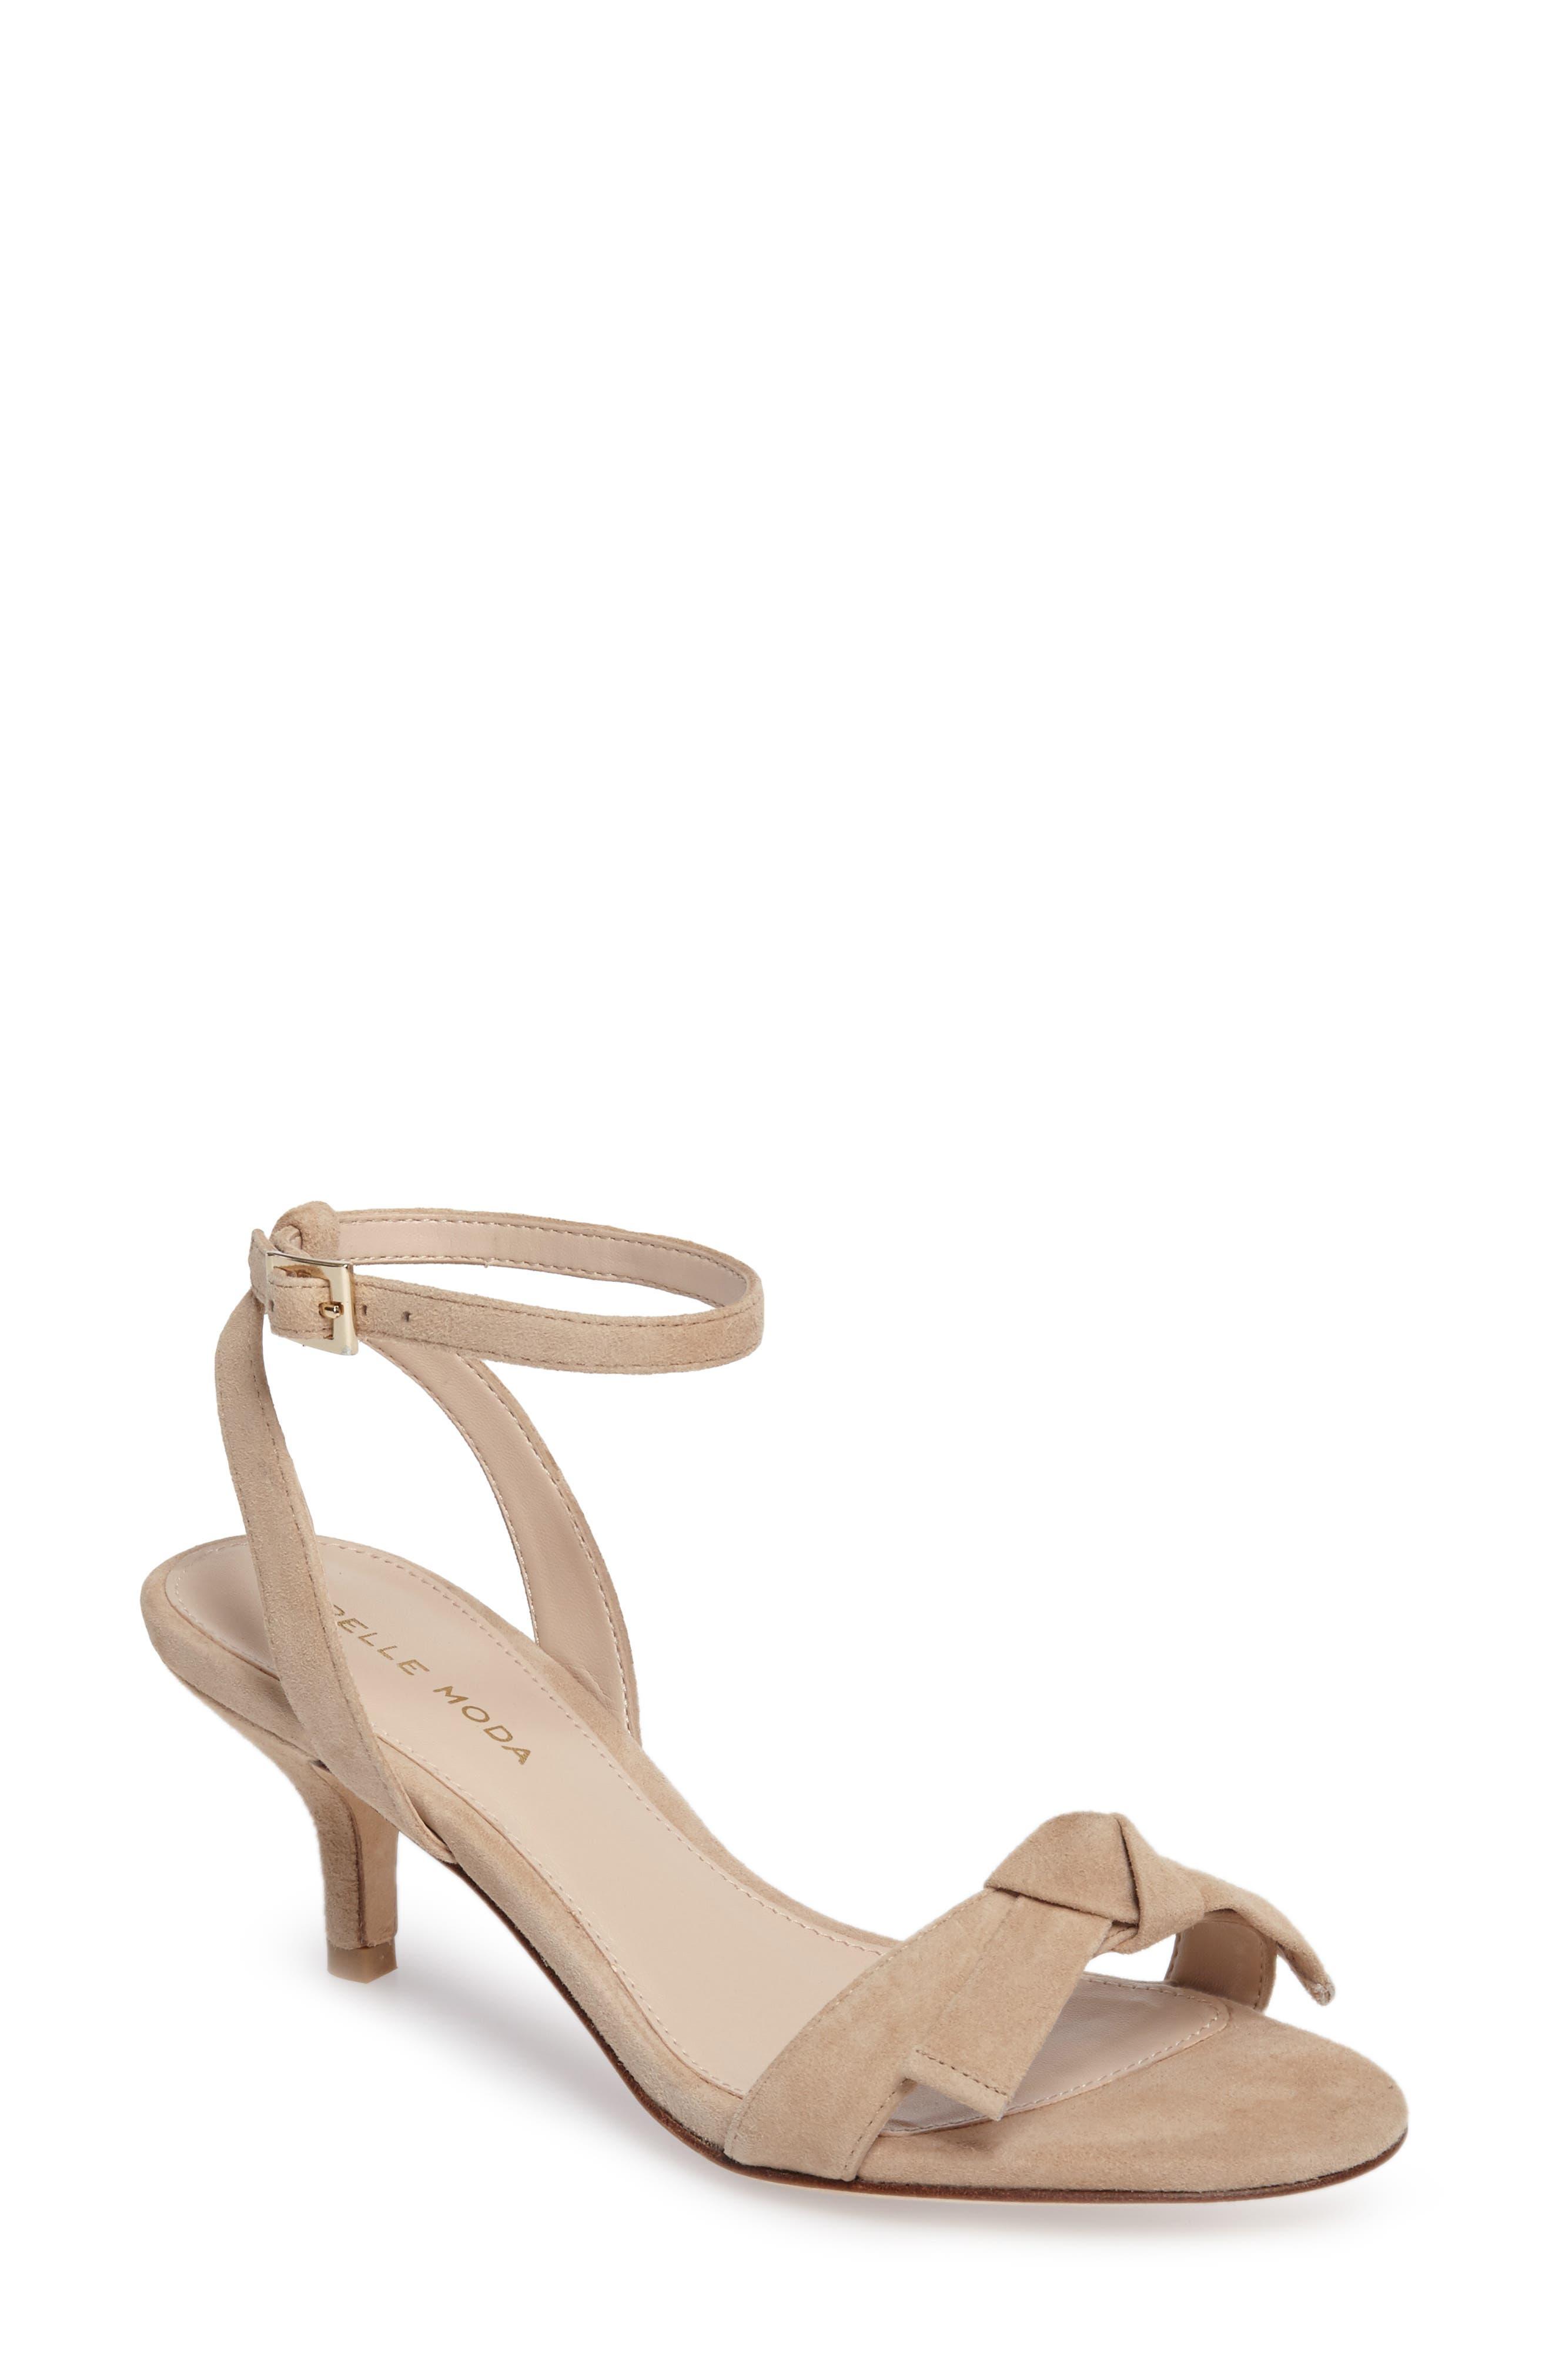 Alternate Image 1 Selected - Pelle Moda Alexia 2 Sandal (Women)